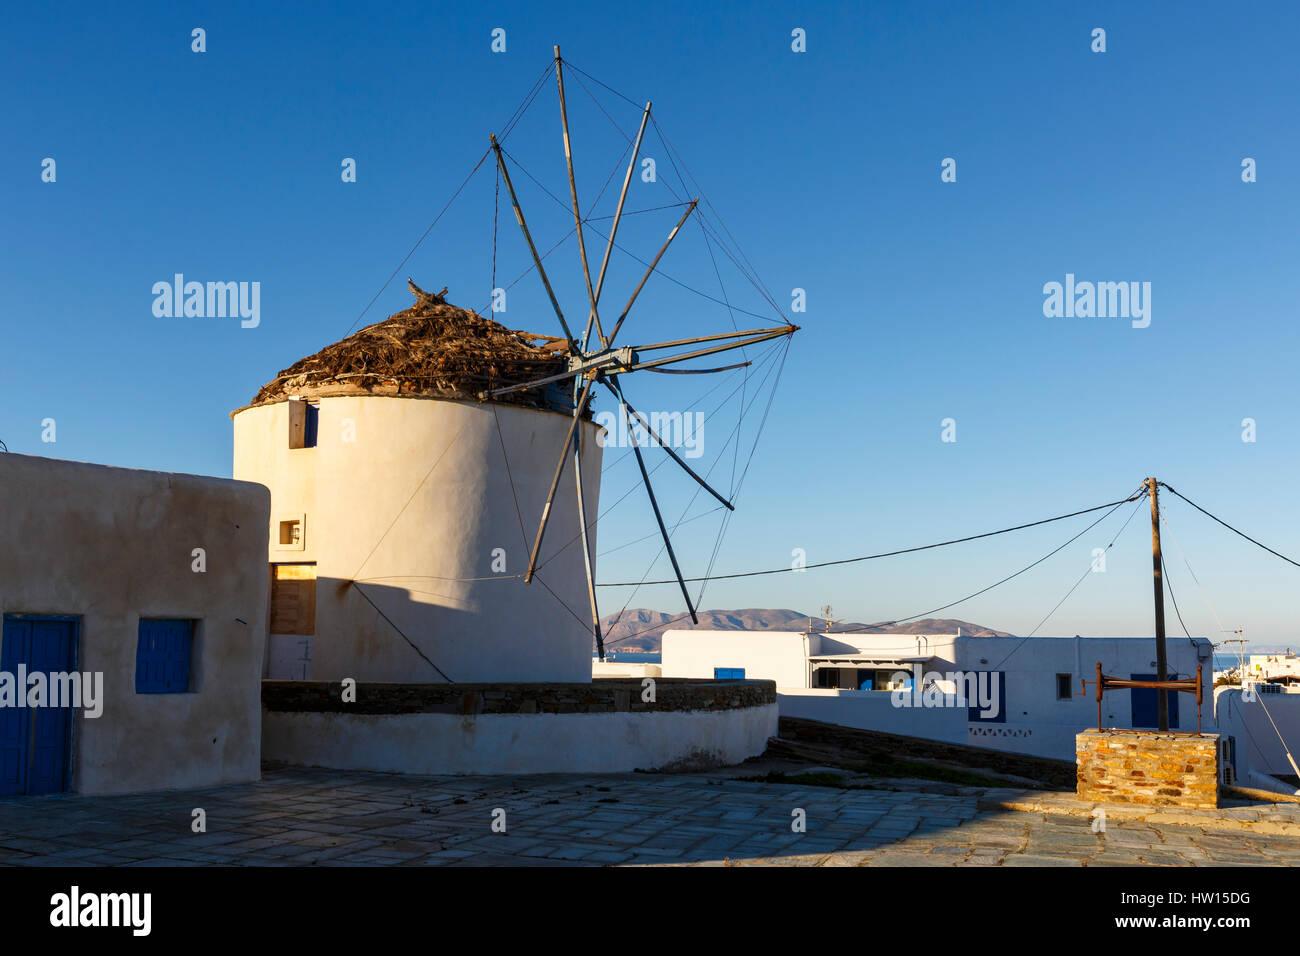 Windmill in Chora on Ios island, Greece. - Stock Image